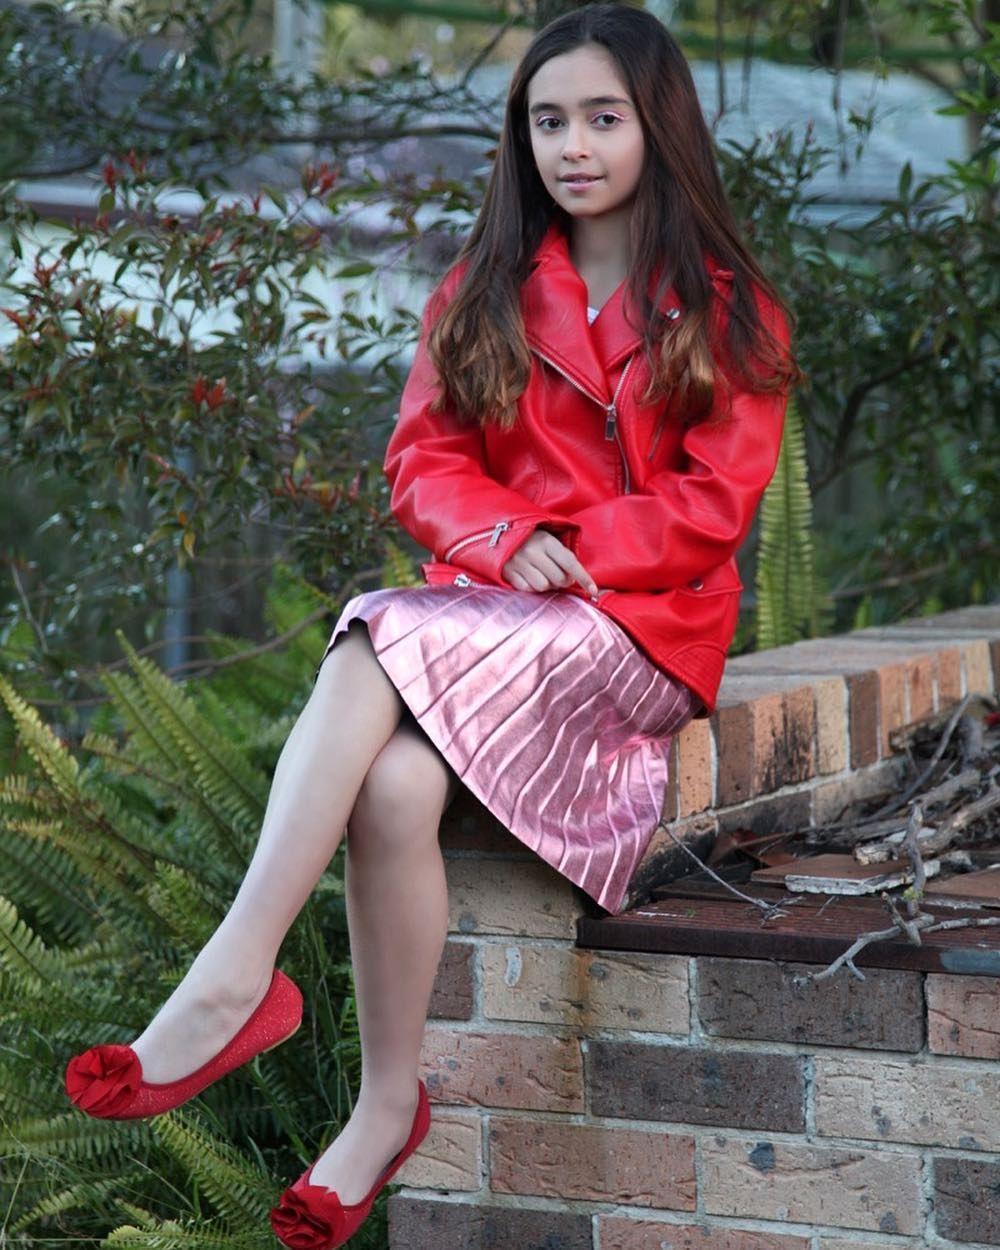 ⚠️DO NOT REPOST @scottlivia2 Photo Without My Permission...⚠️DO NOT REPOST @scottlivia2 Photo Without My Permission  .  A Red Jacket to Love ❤️  #redcolor #red #redjacket #leatherjacket #pinkmillennial #millenials #pink #pleatedskirt #skirt #redshoes #ballerinashoes #shoesaddict #kidsmodel #followme #10k #goals #followers #zara #postmyfashionkid #hypebeast #influencer #longhair #hairstyle #fashionable #fashionblogger #photooftheday #ootdfashion